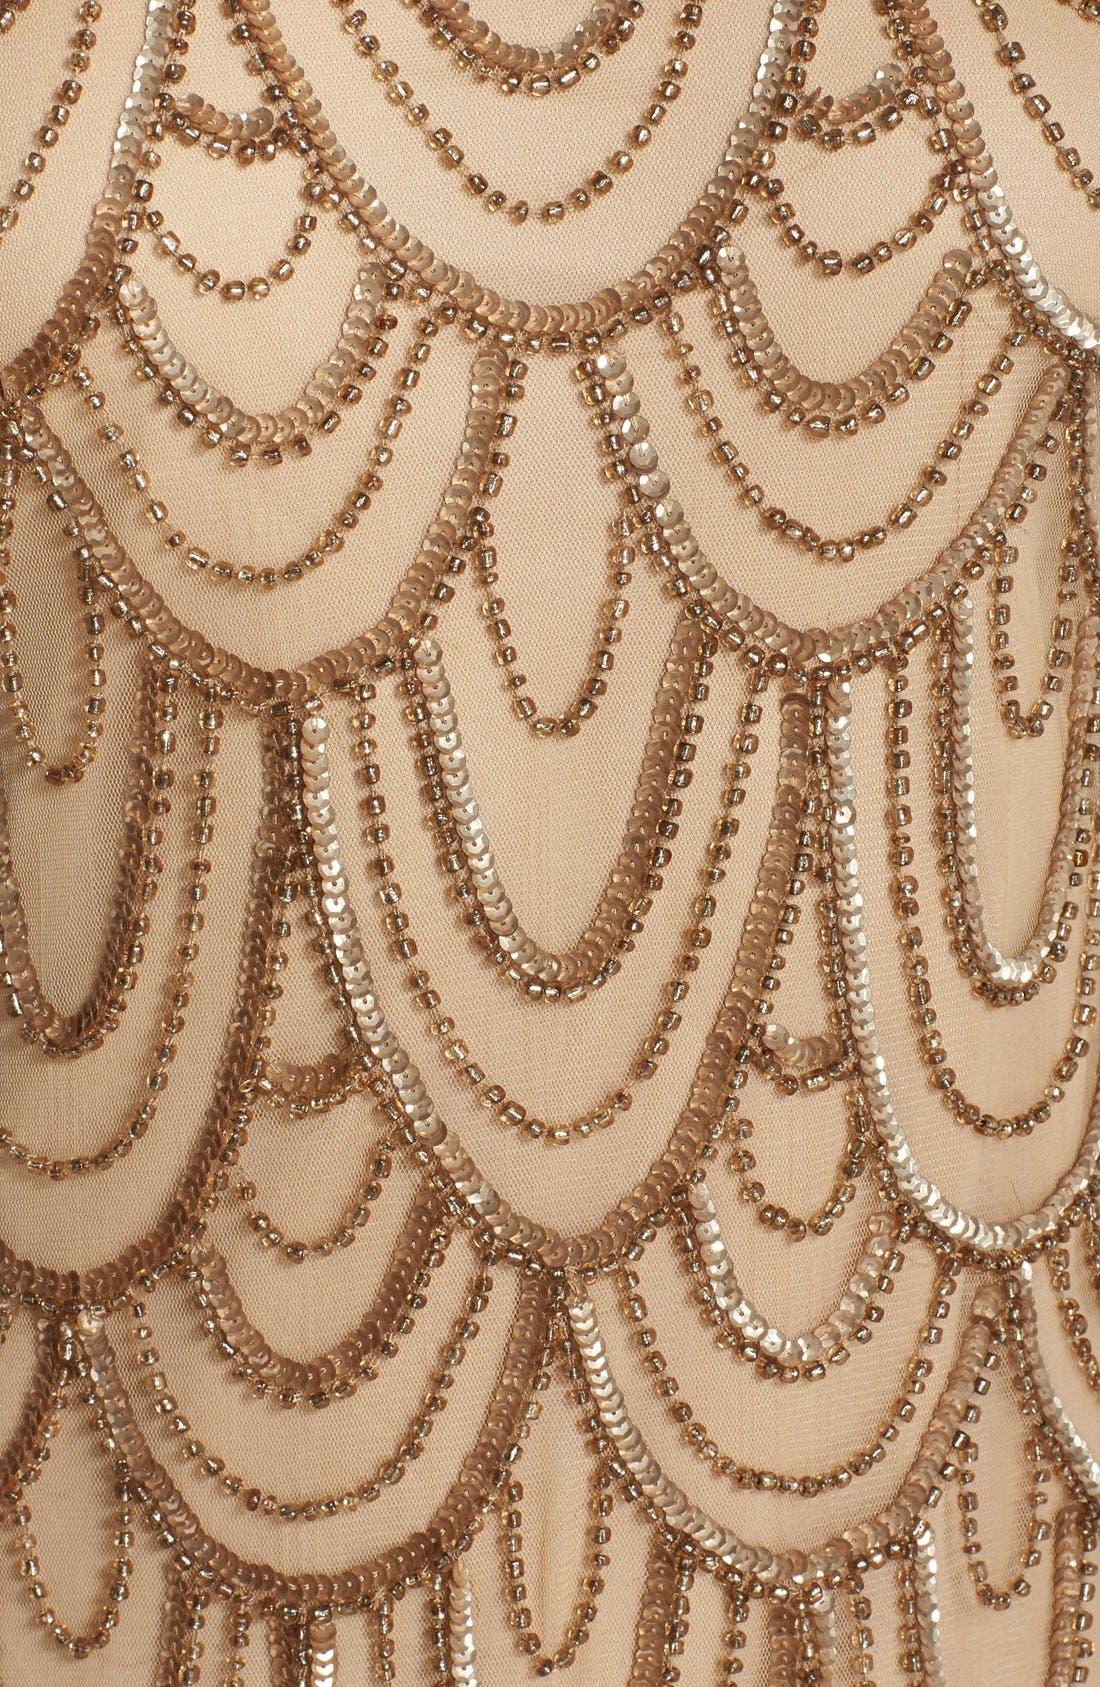 Embellished Mesh Sheath Dress,                             Alternate thumbnail 112, color,